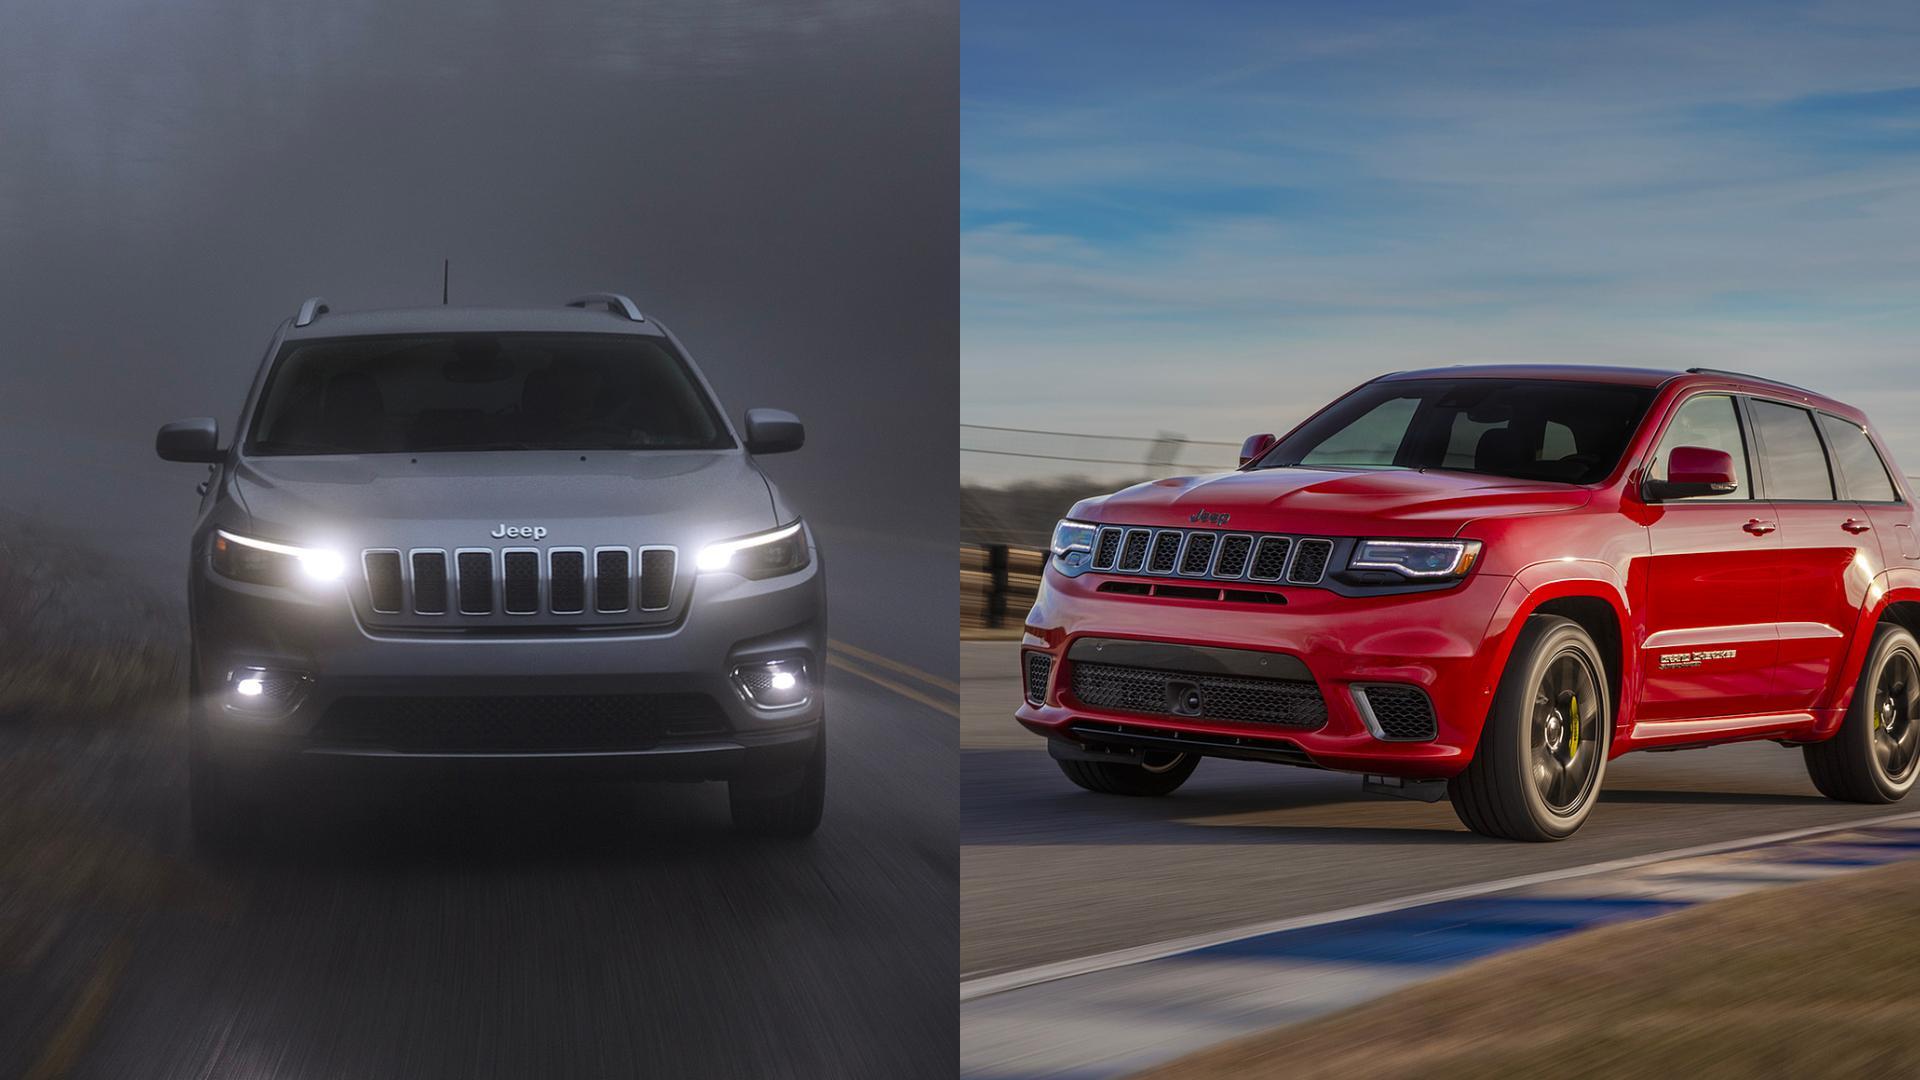 Jeep Cherokee vs Grand Cherokee